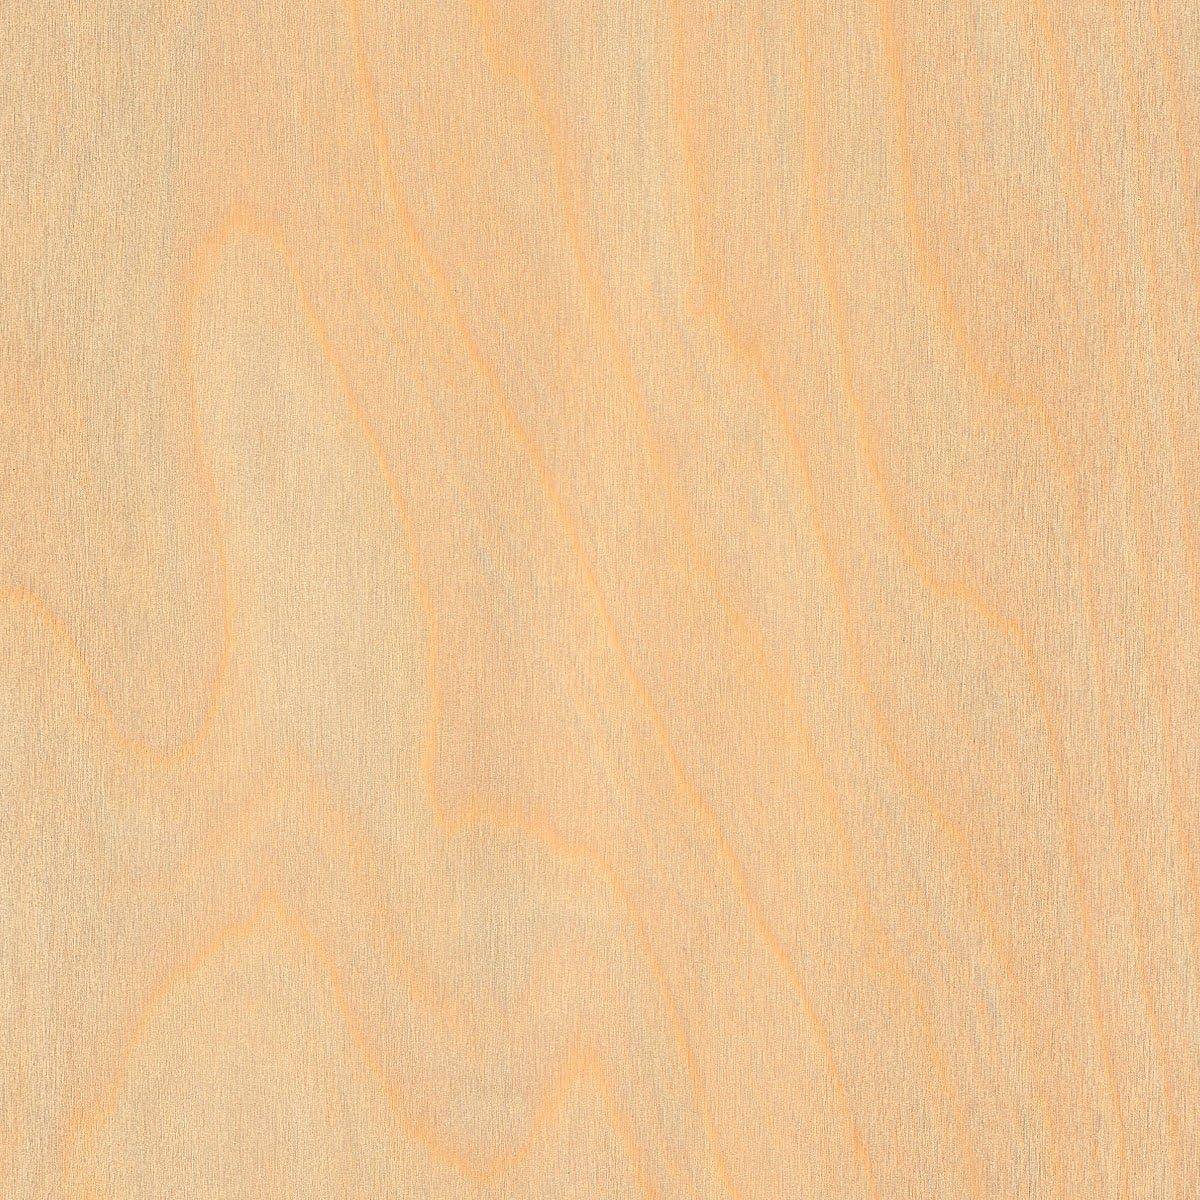 Wood-All New Free Shipping Birch White Wood Veneer Gr 48x96